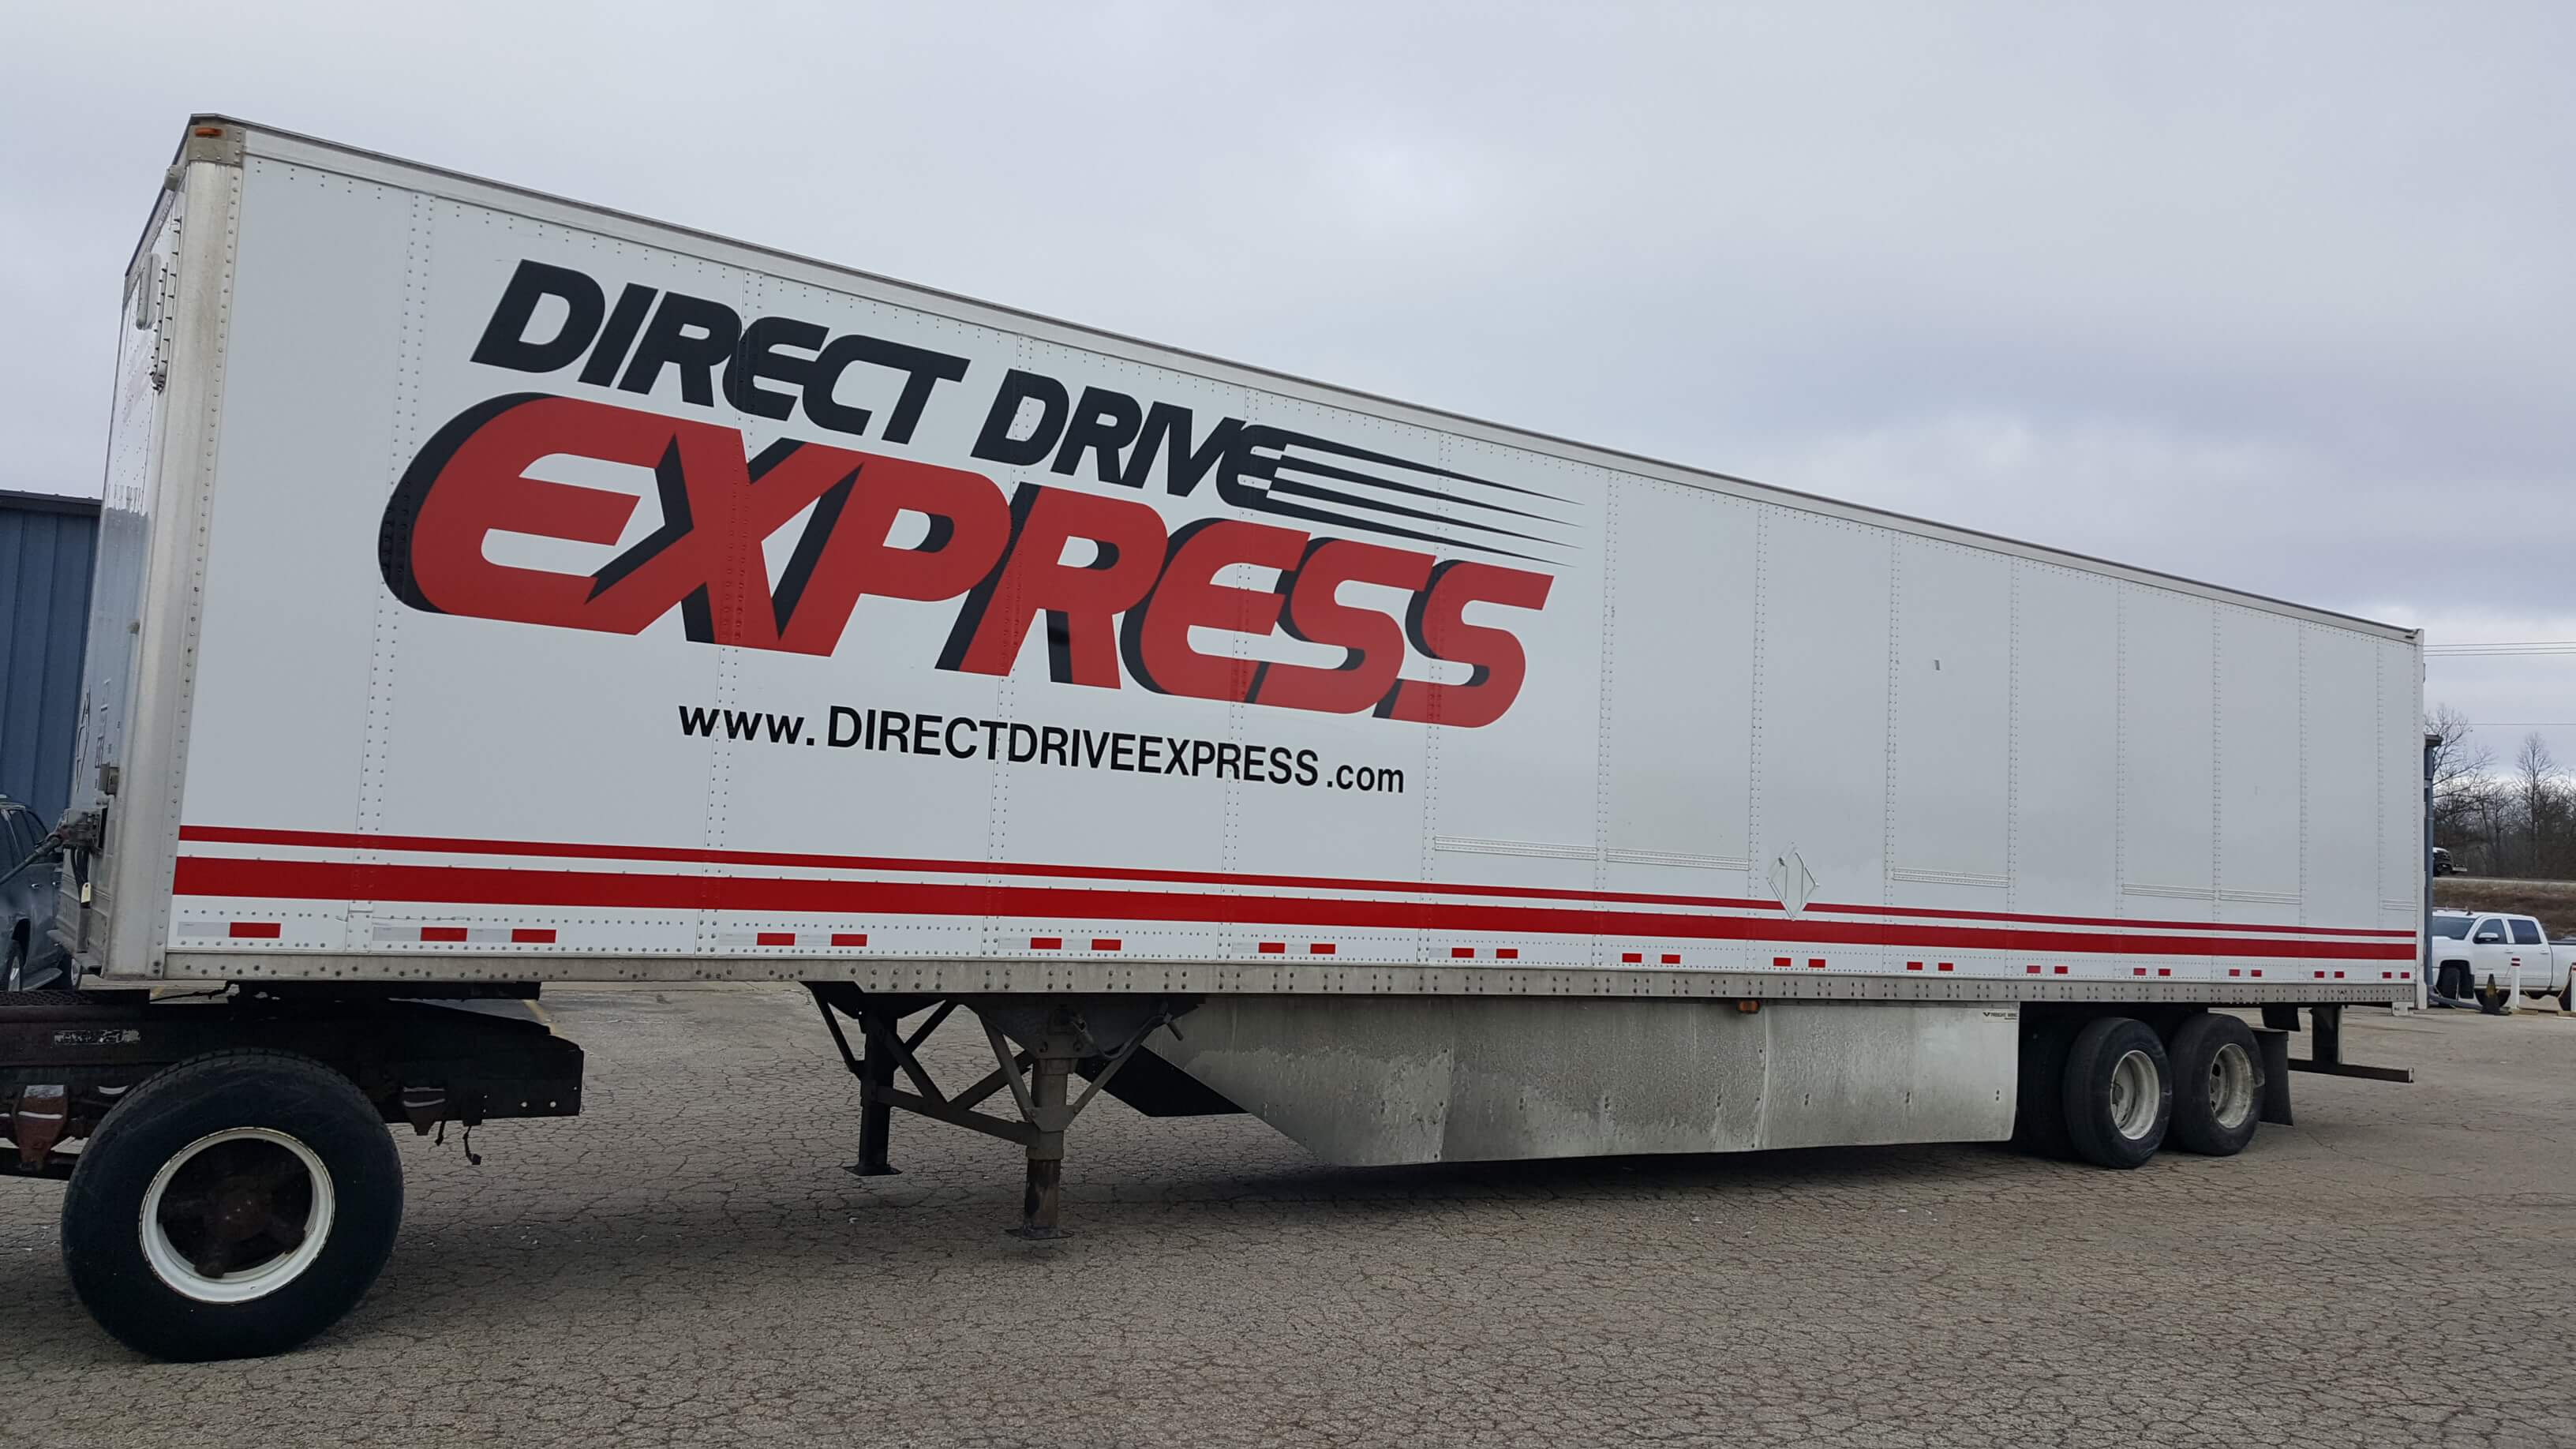 Direct drive express large vinyl wrap